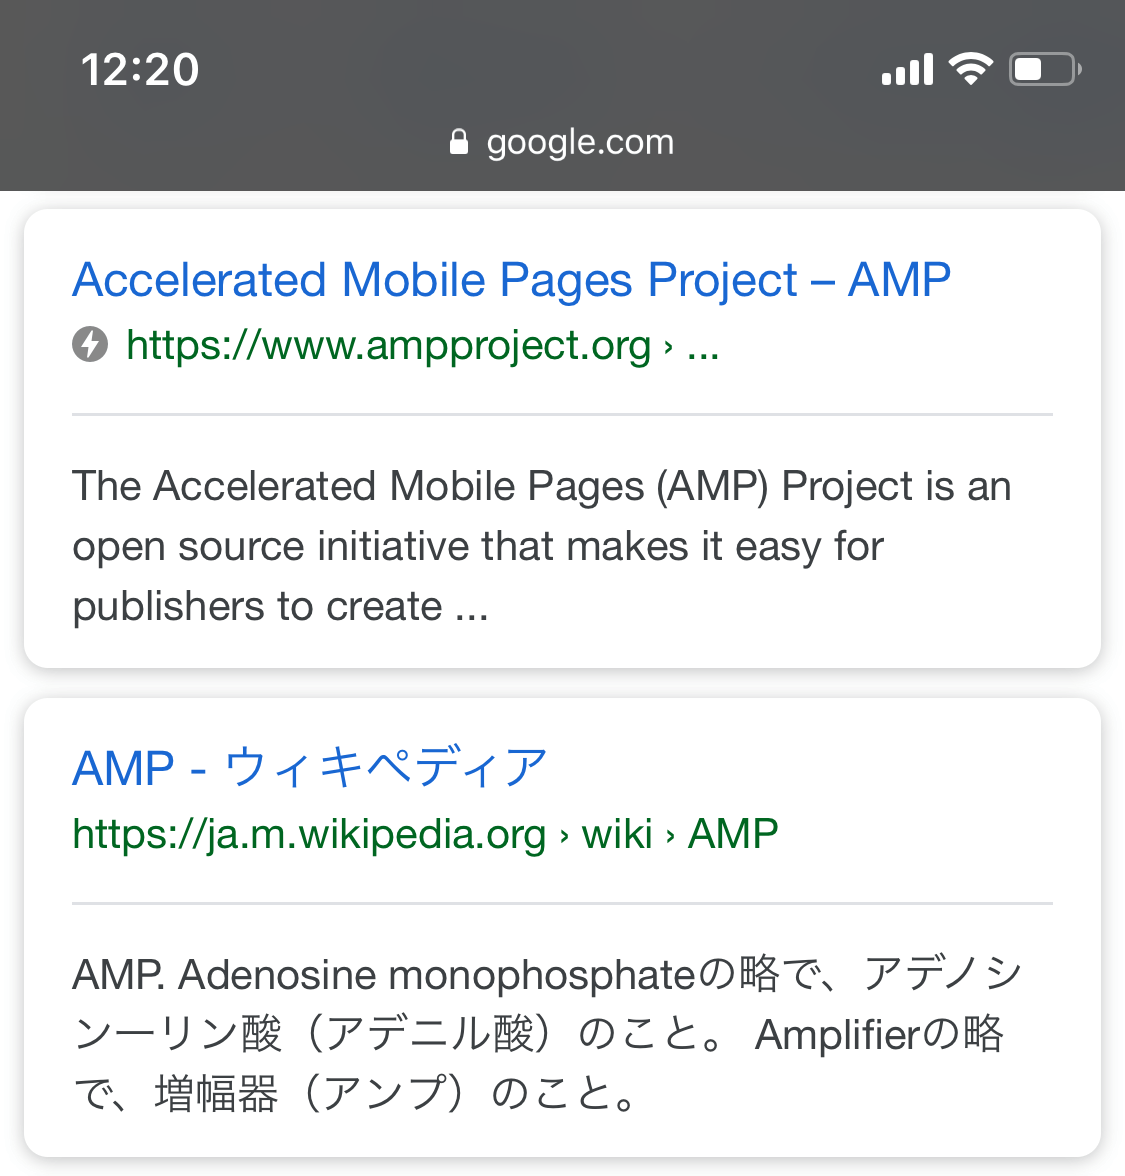 amp_pic1.png